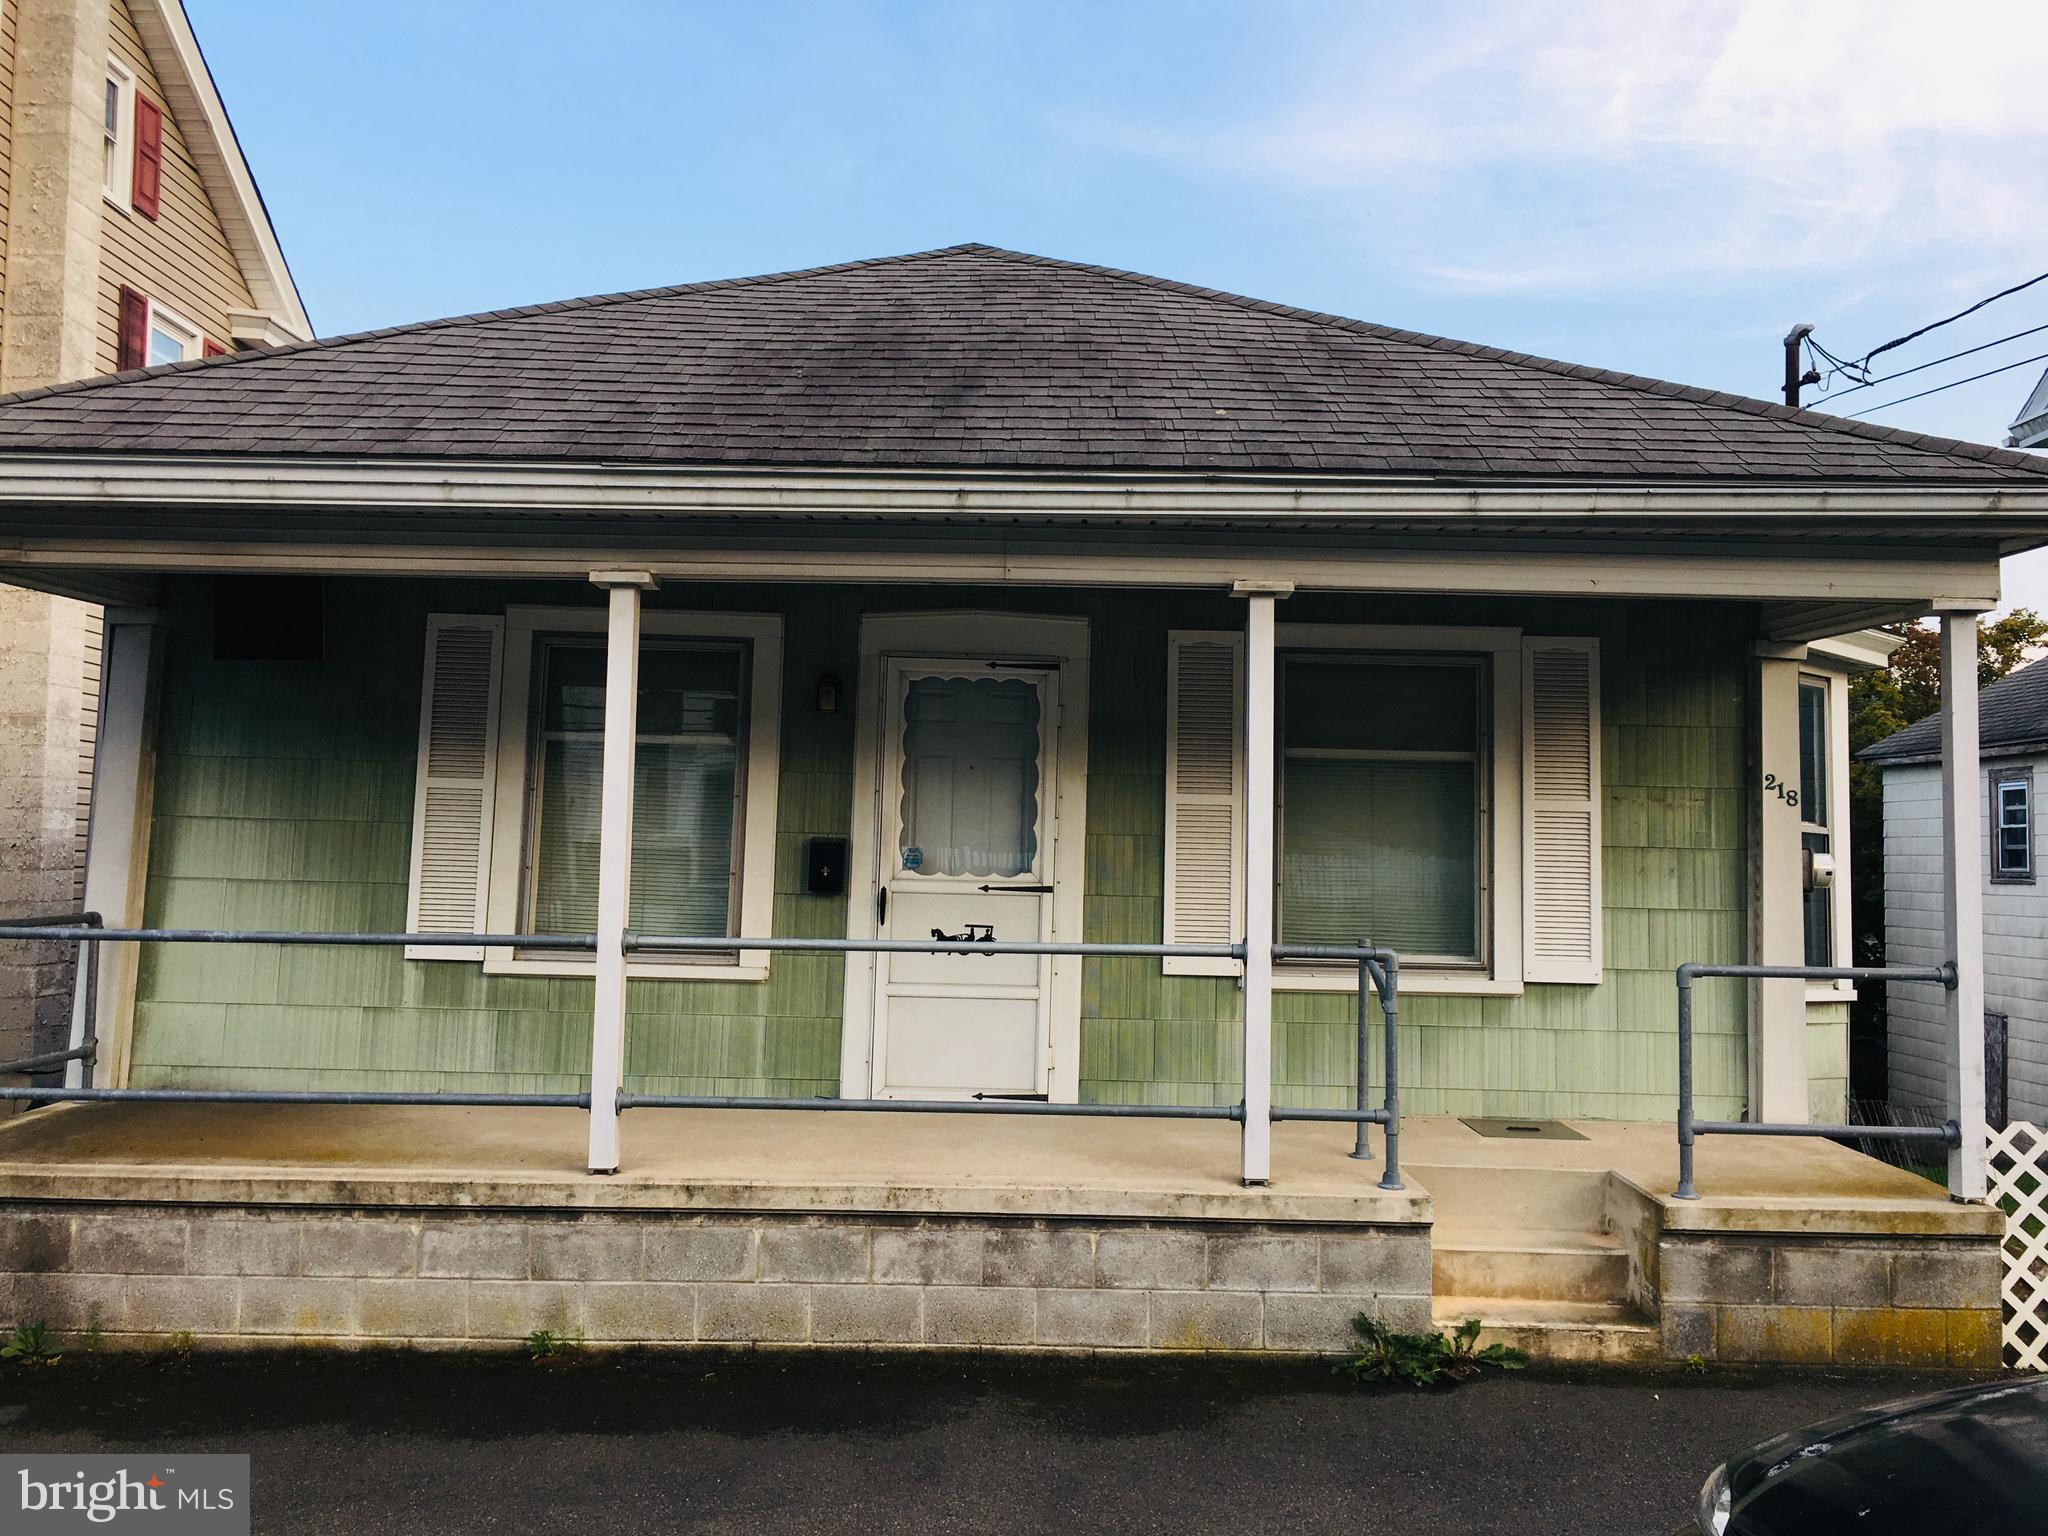 218 E BROAD STREET, WILLIAMSTOWN, PA 17098